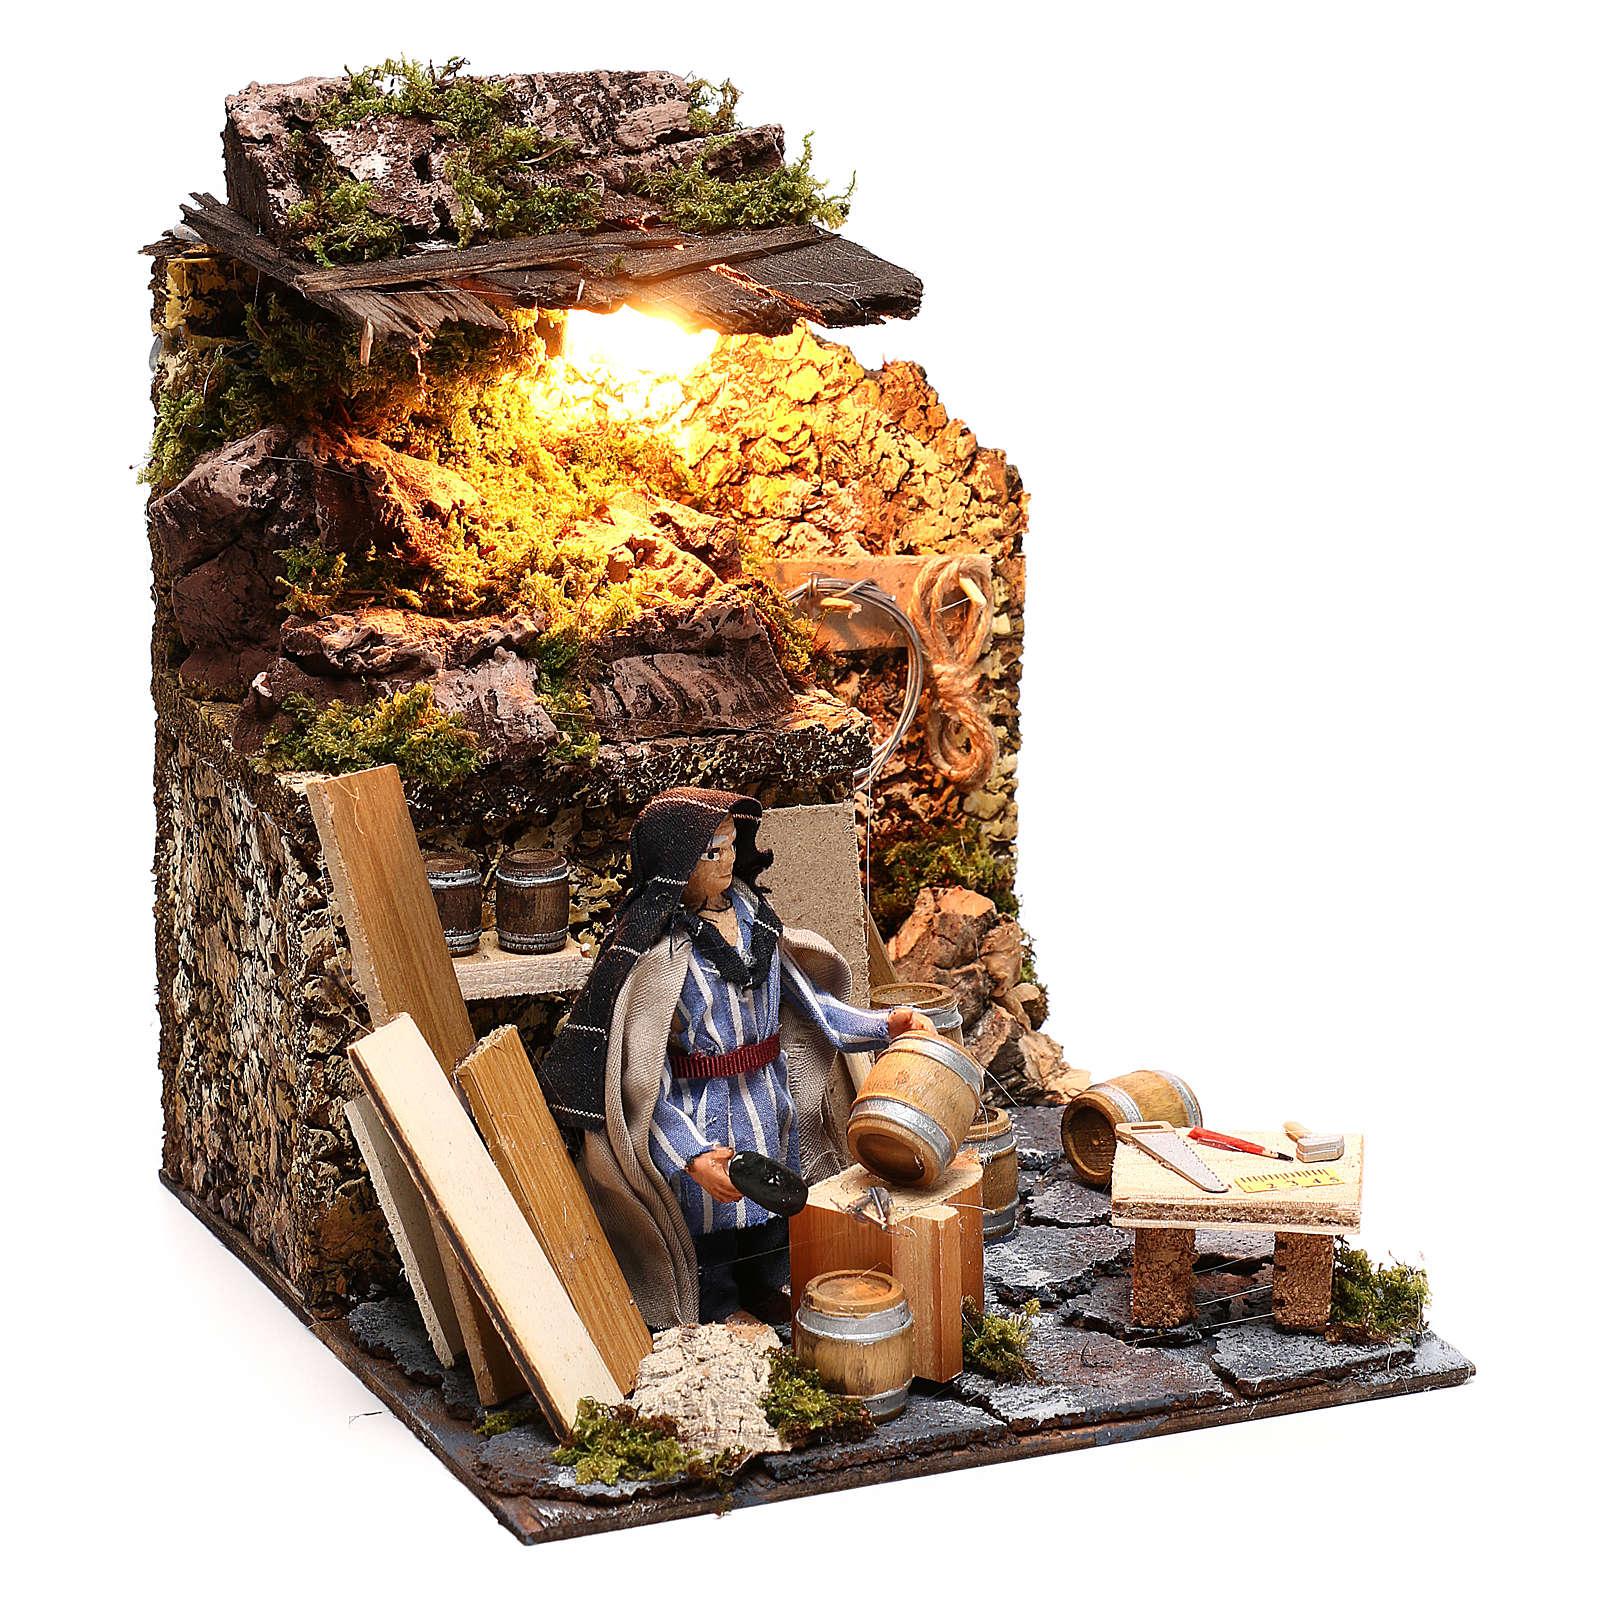 Neapolitan nativity scene moving statue barrel builder 12 cm 4